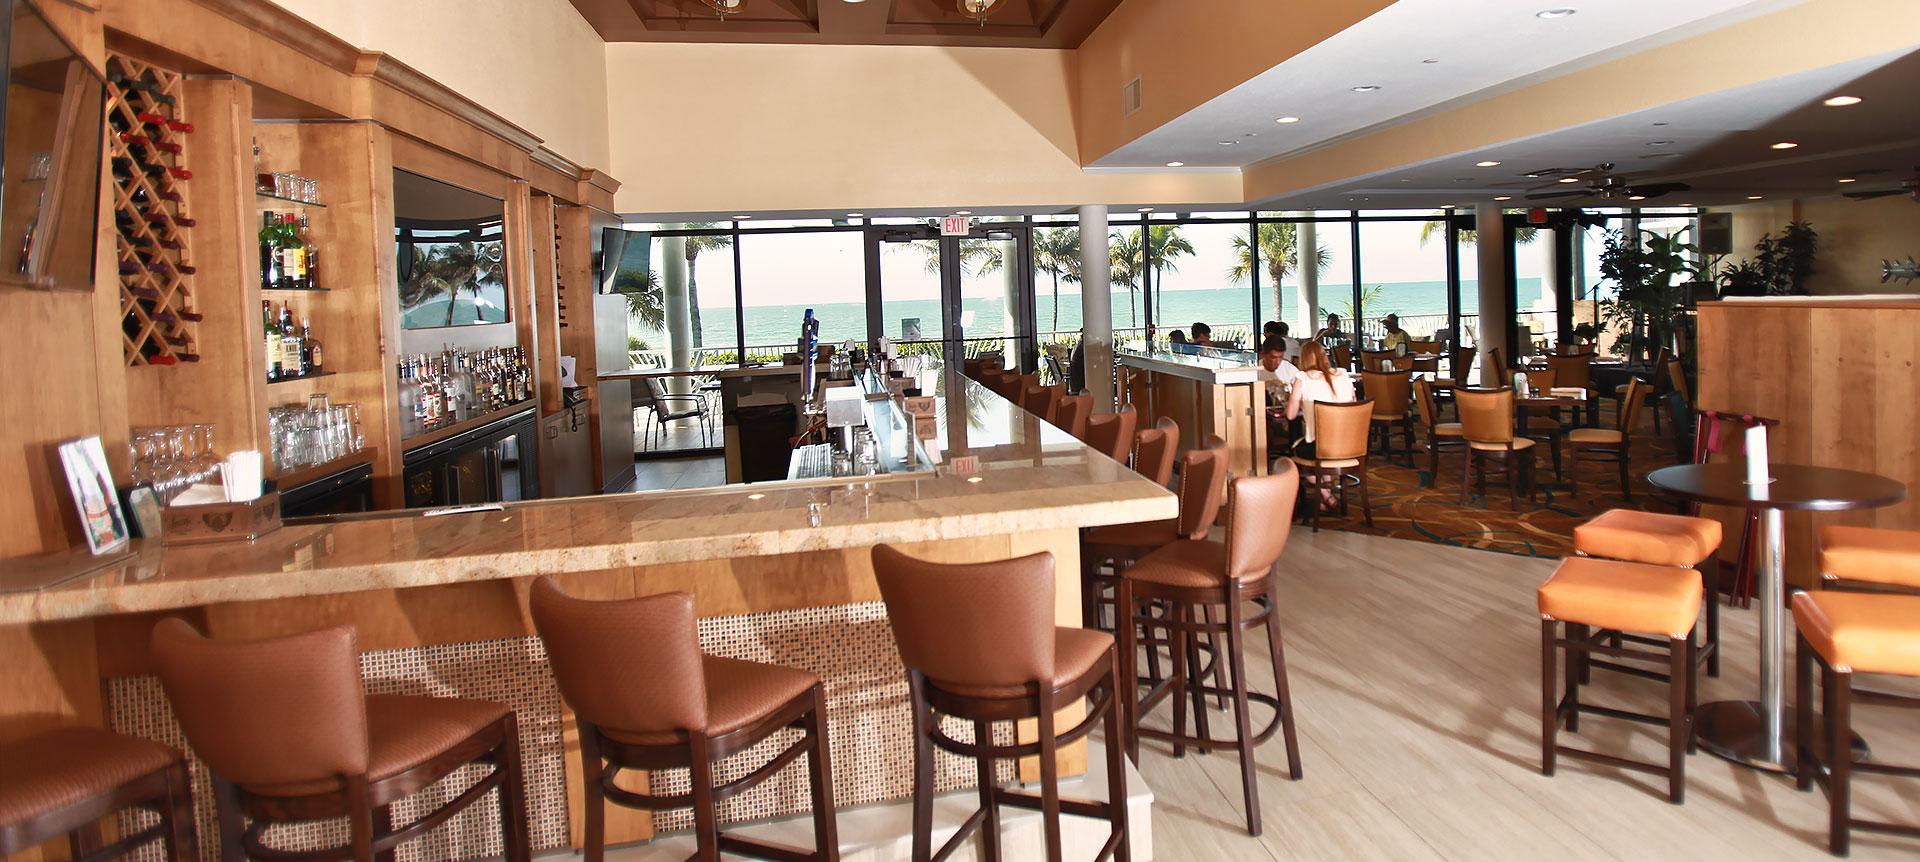 Sundial Beach Resort & Spa - Sea breeze Cafe